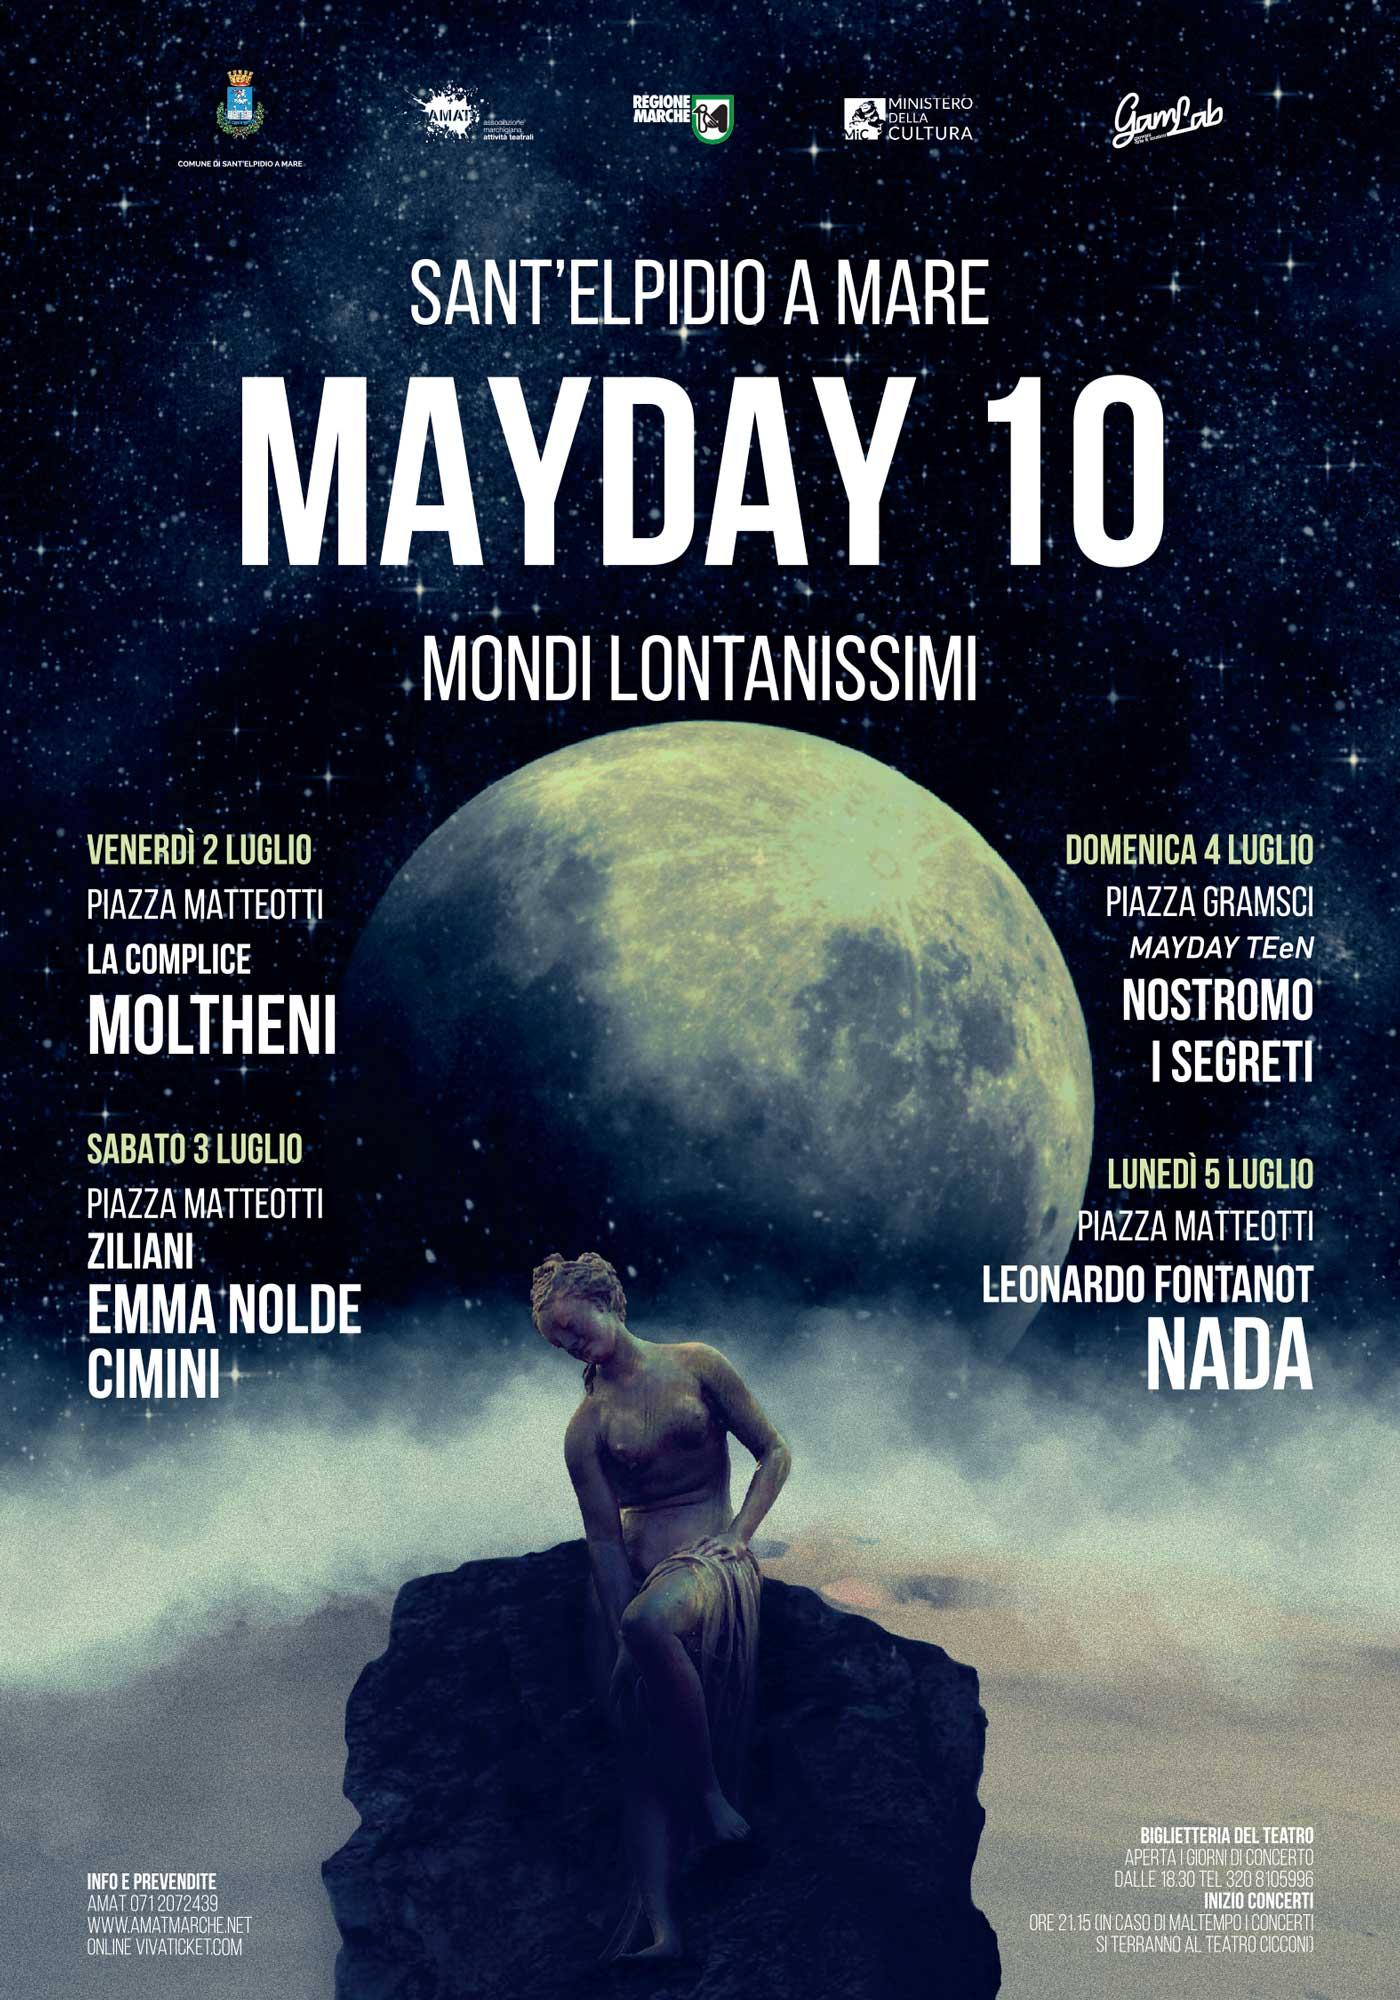 Sant'Elpidio a Mare | MayDay 10